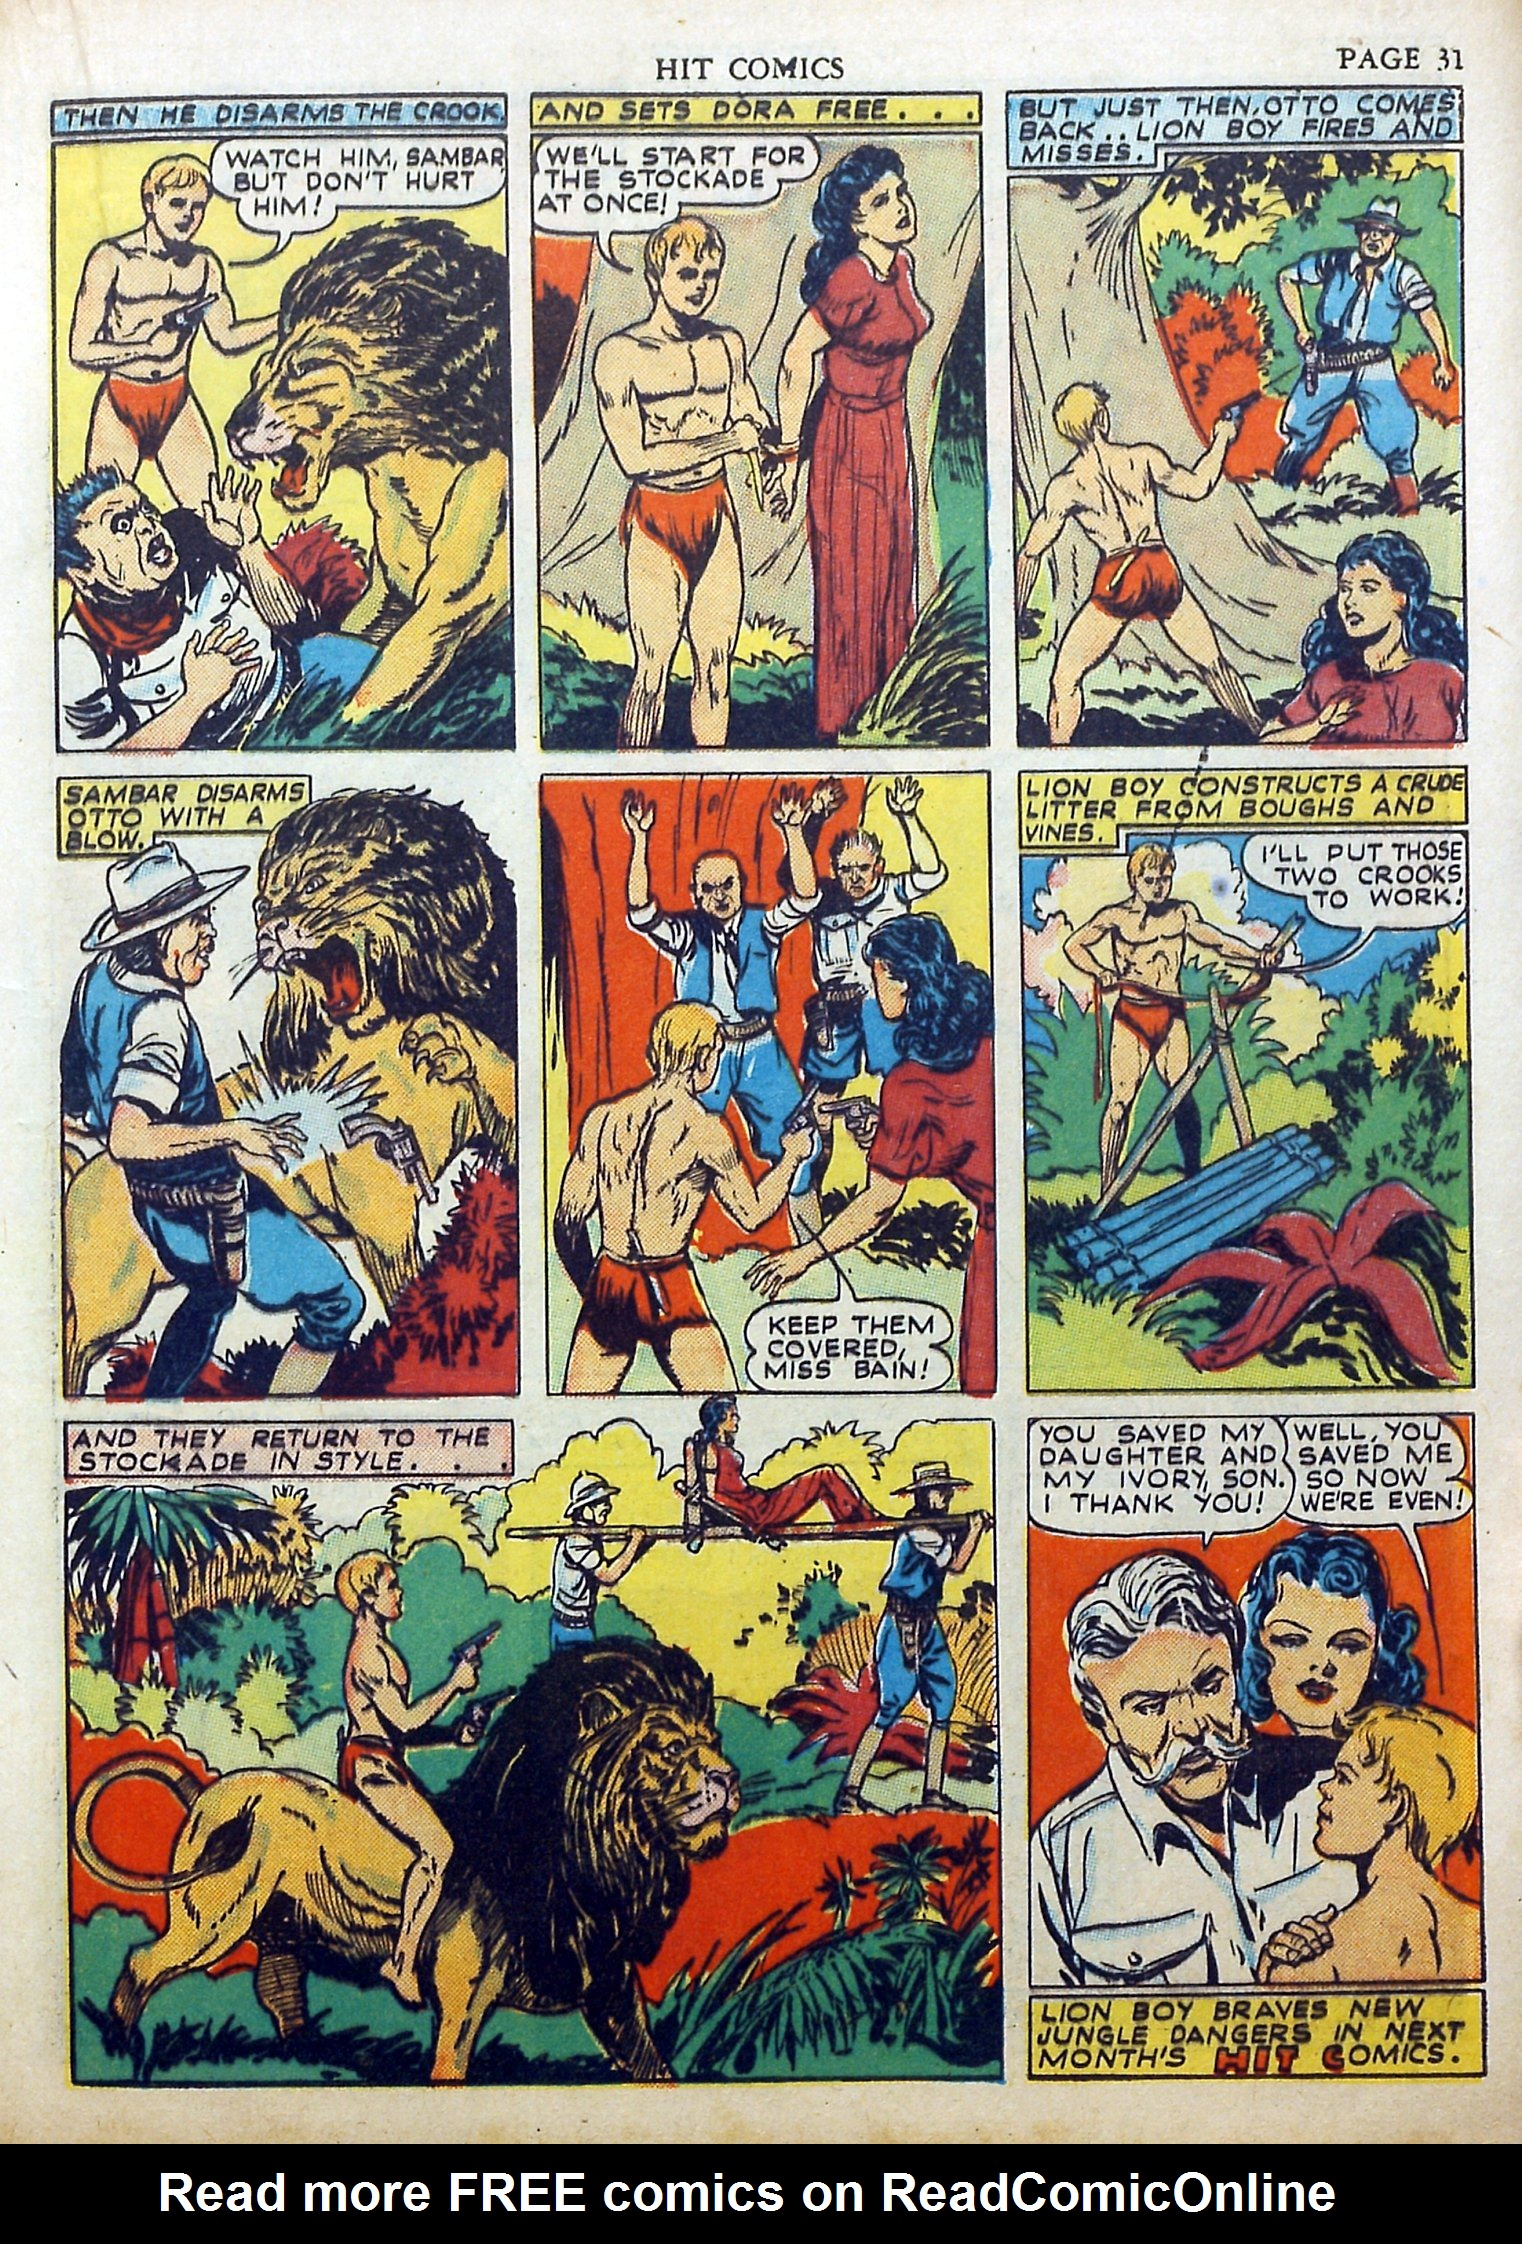 Read online Hit Comics comic -  Issue #17 - 33